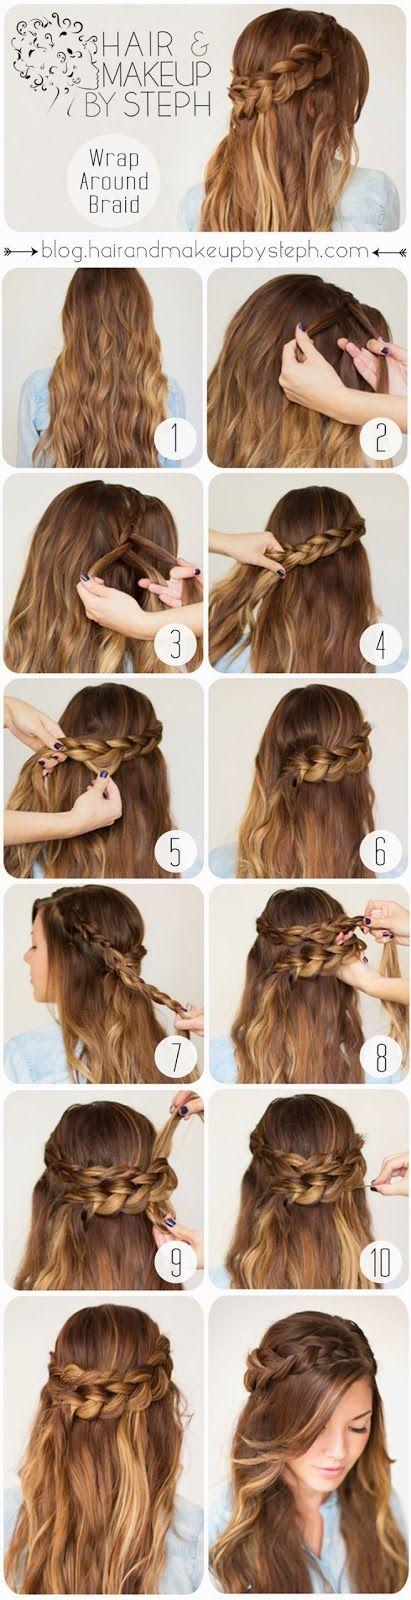 How To Do a Wrap Around Braid